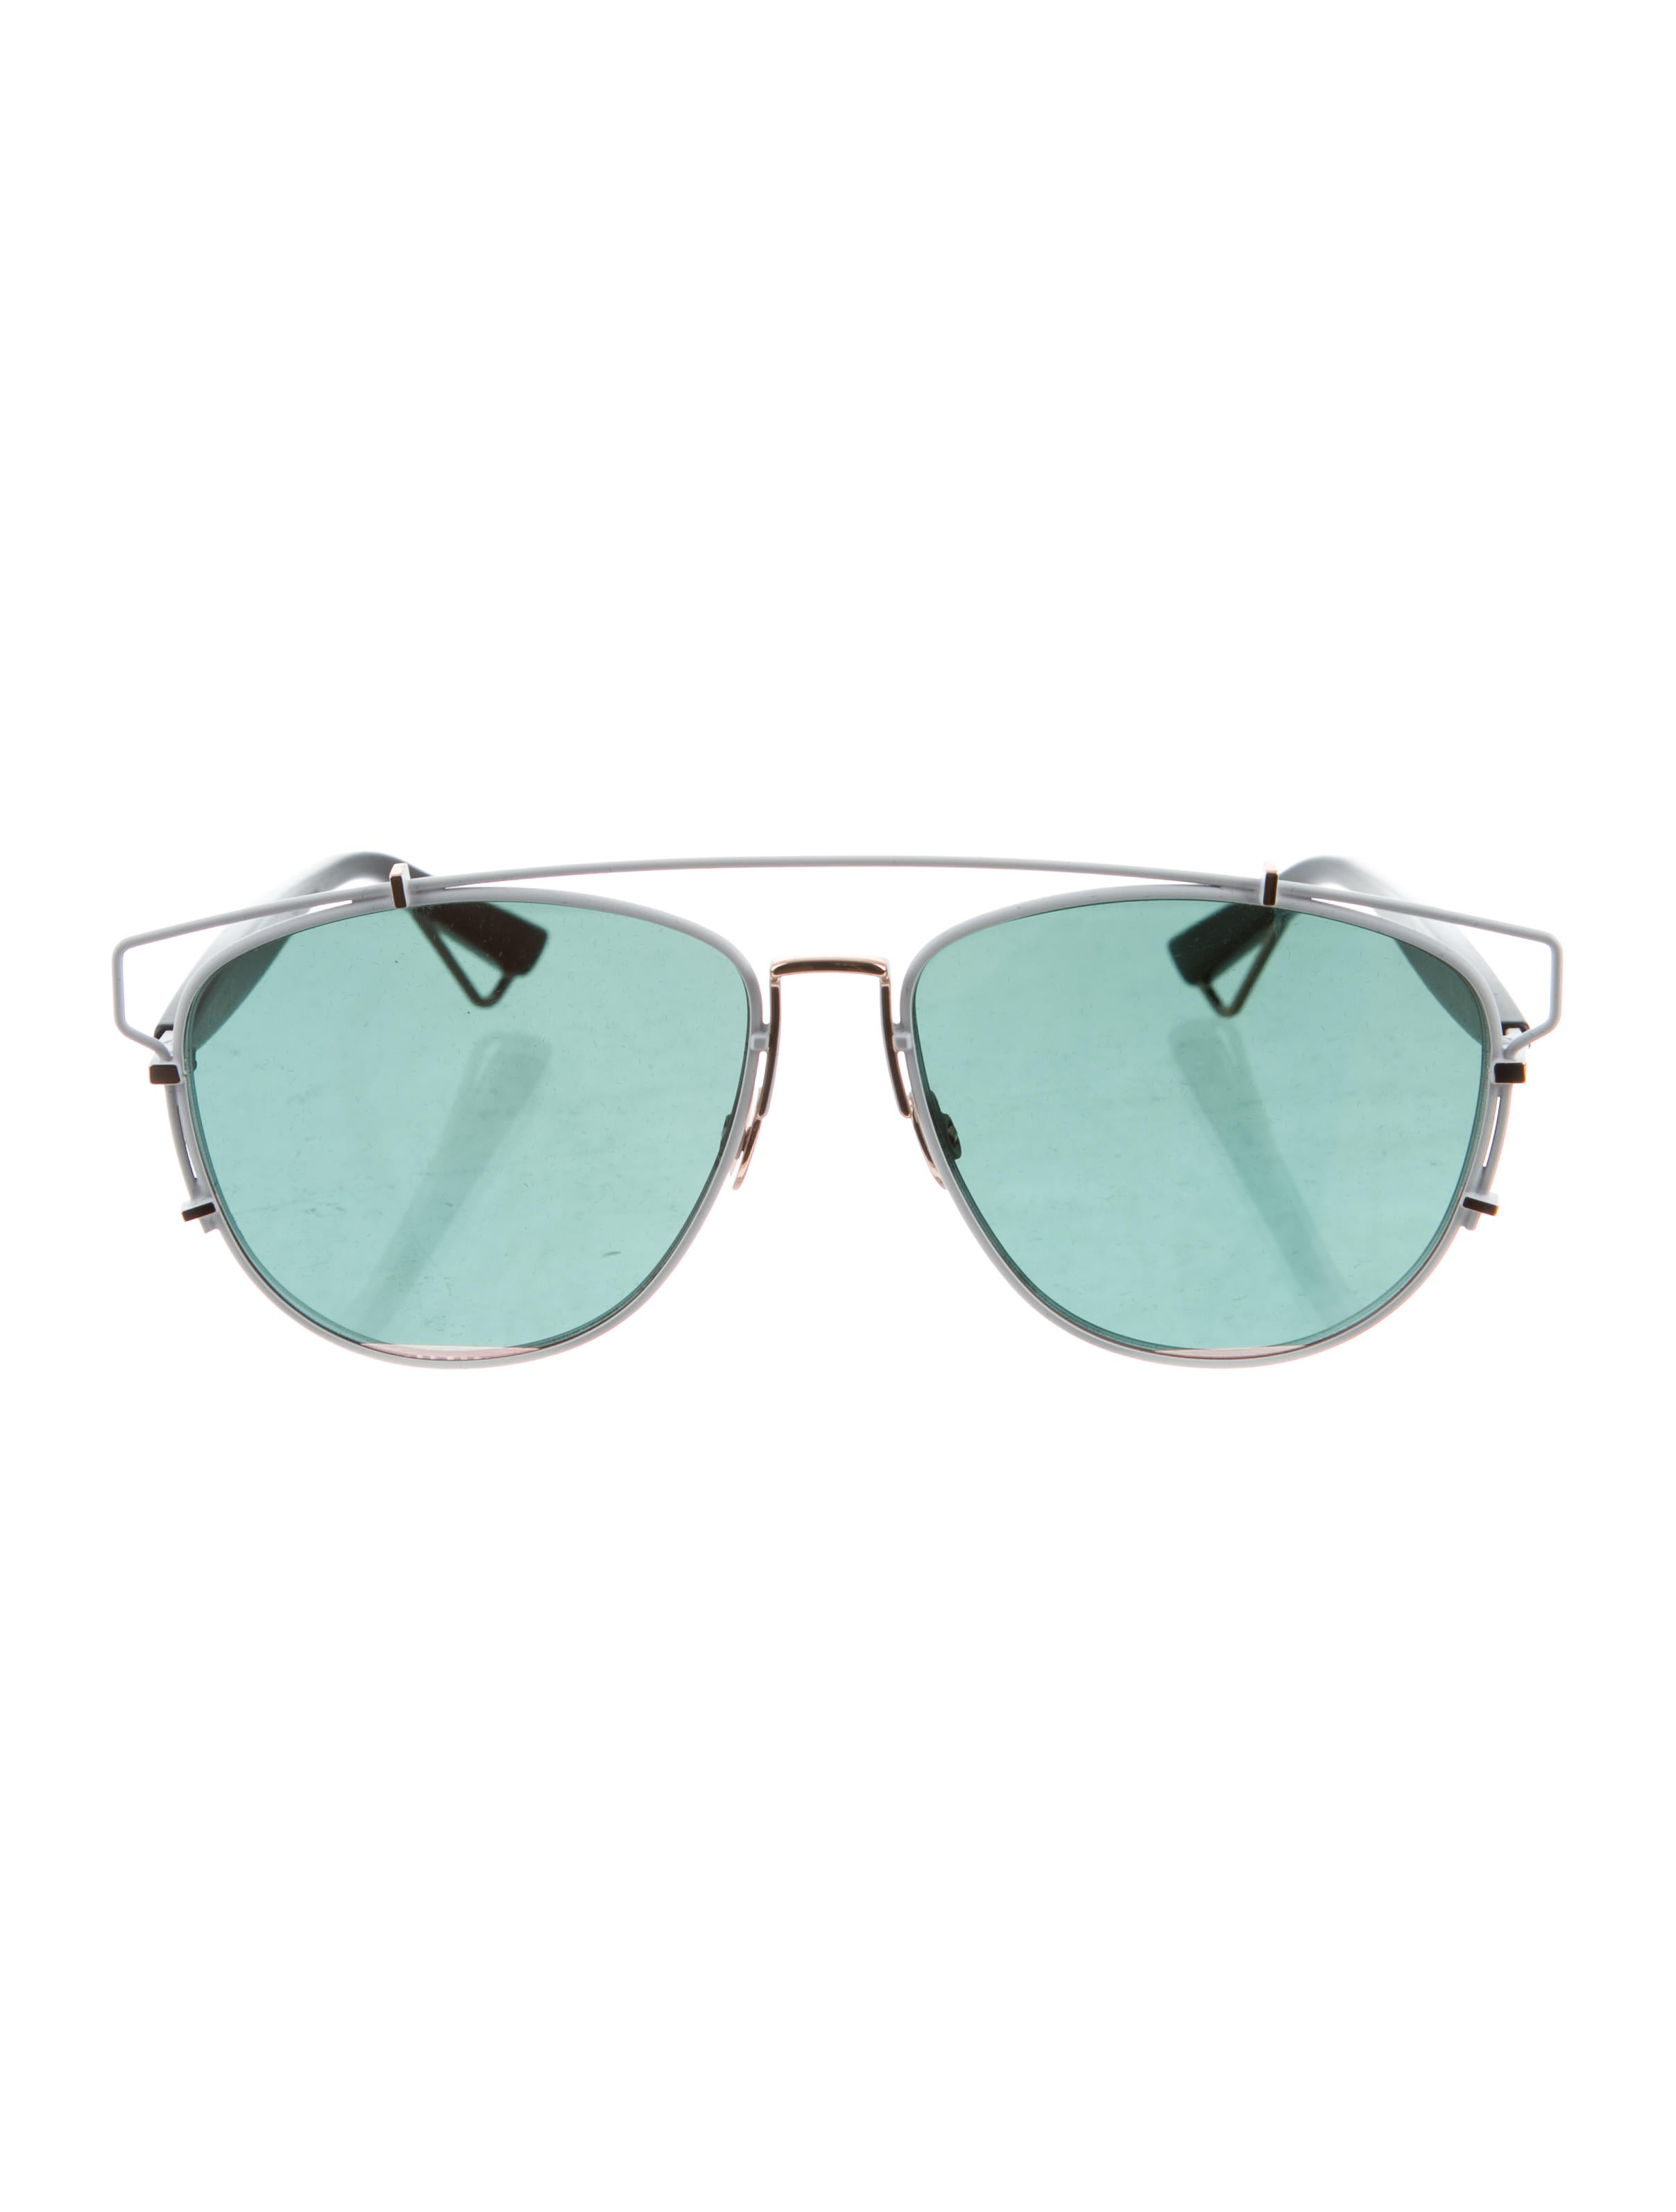 9d9cd3ef295 Christian Dior Technologic Mirrored Sunglasses w  Tags - Accessories ...